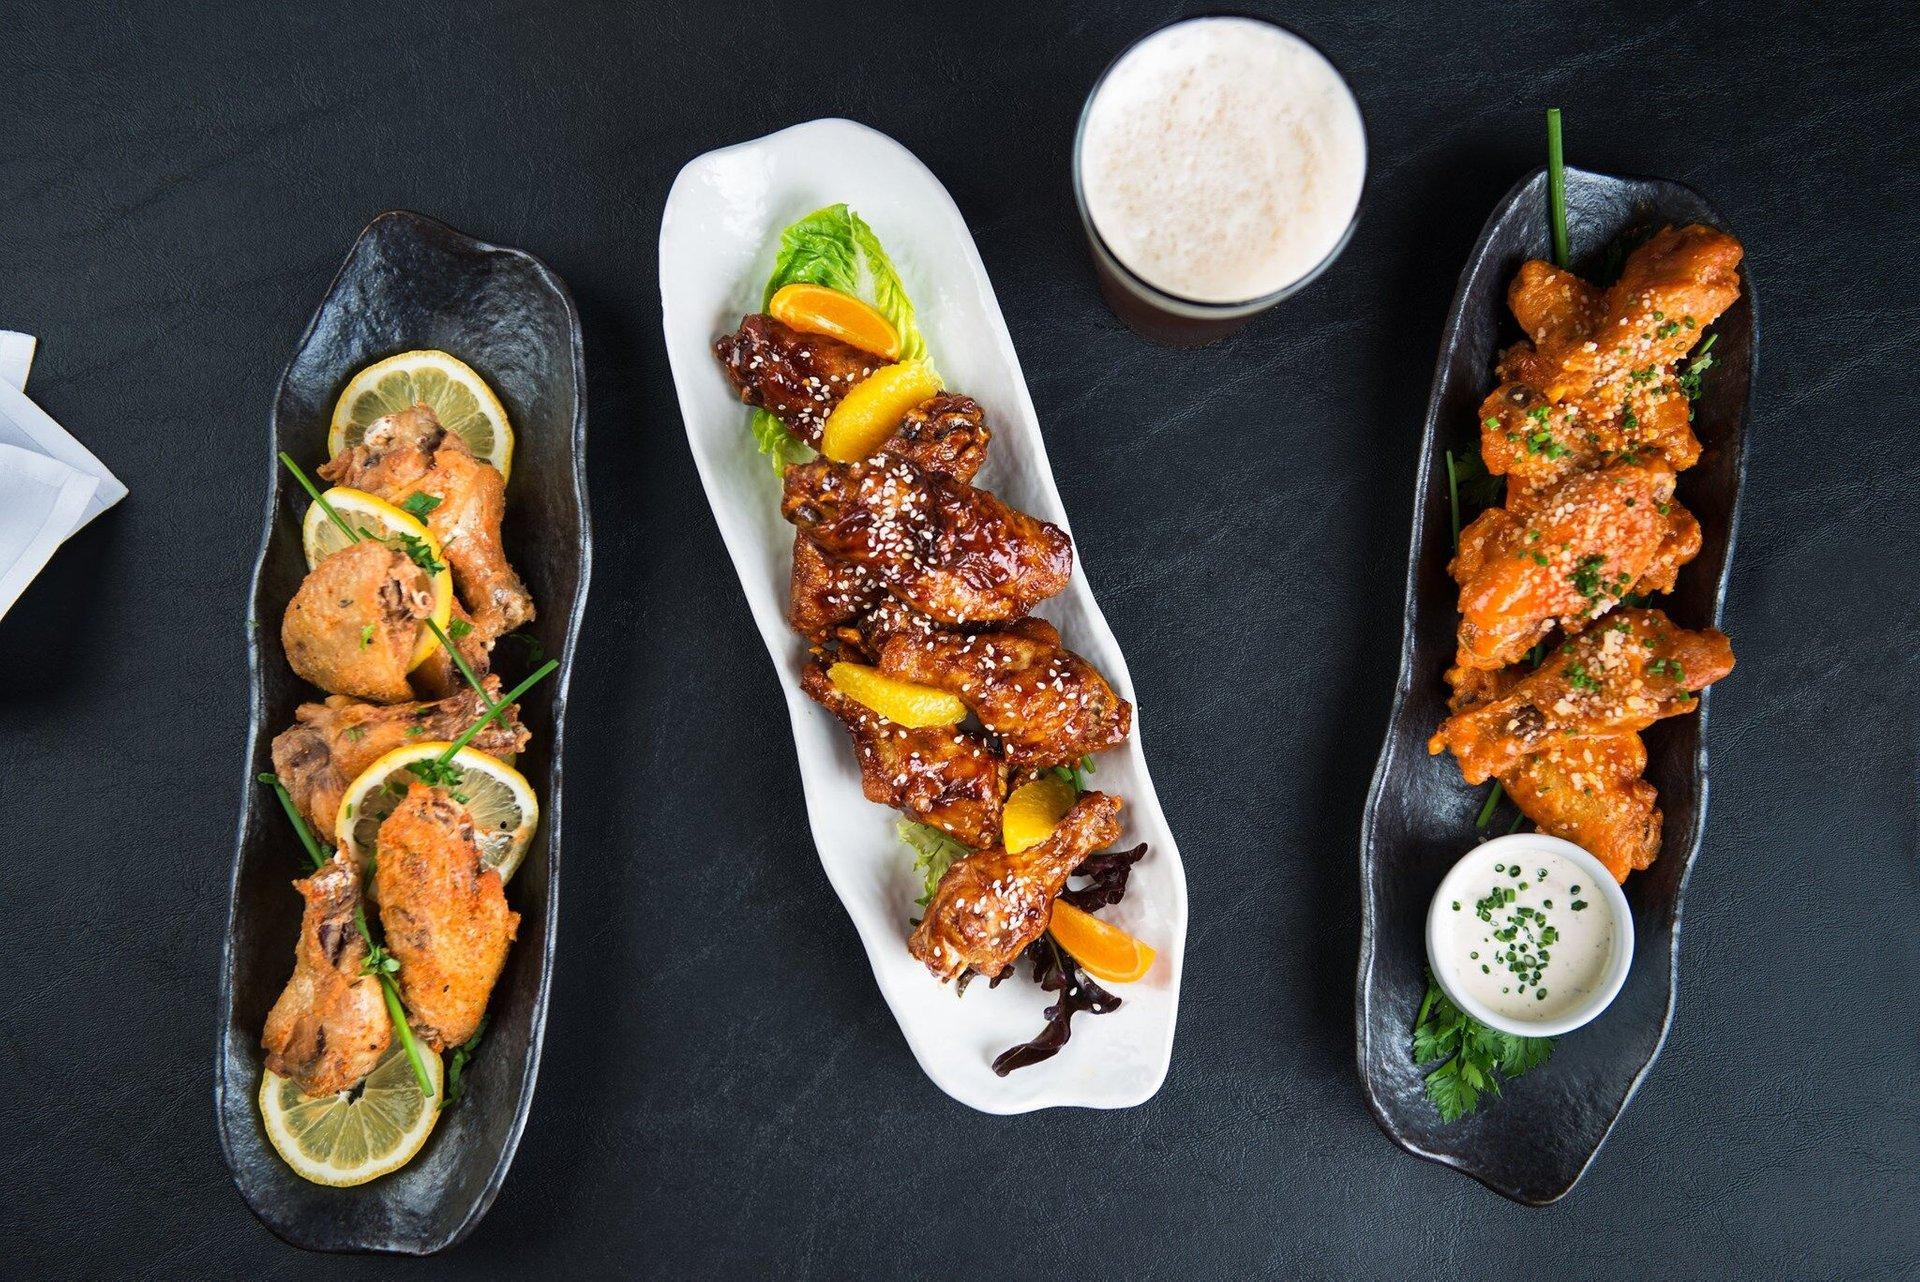 Best time for San Diego Restaurant Week in San Diego 2020